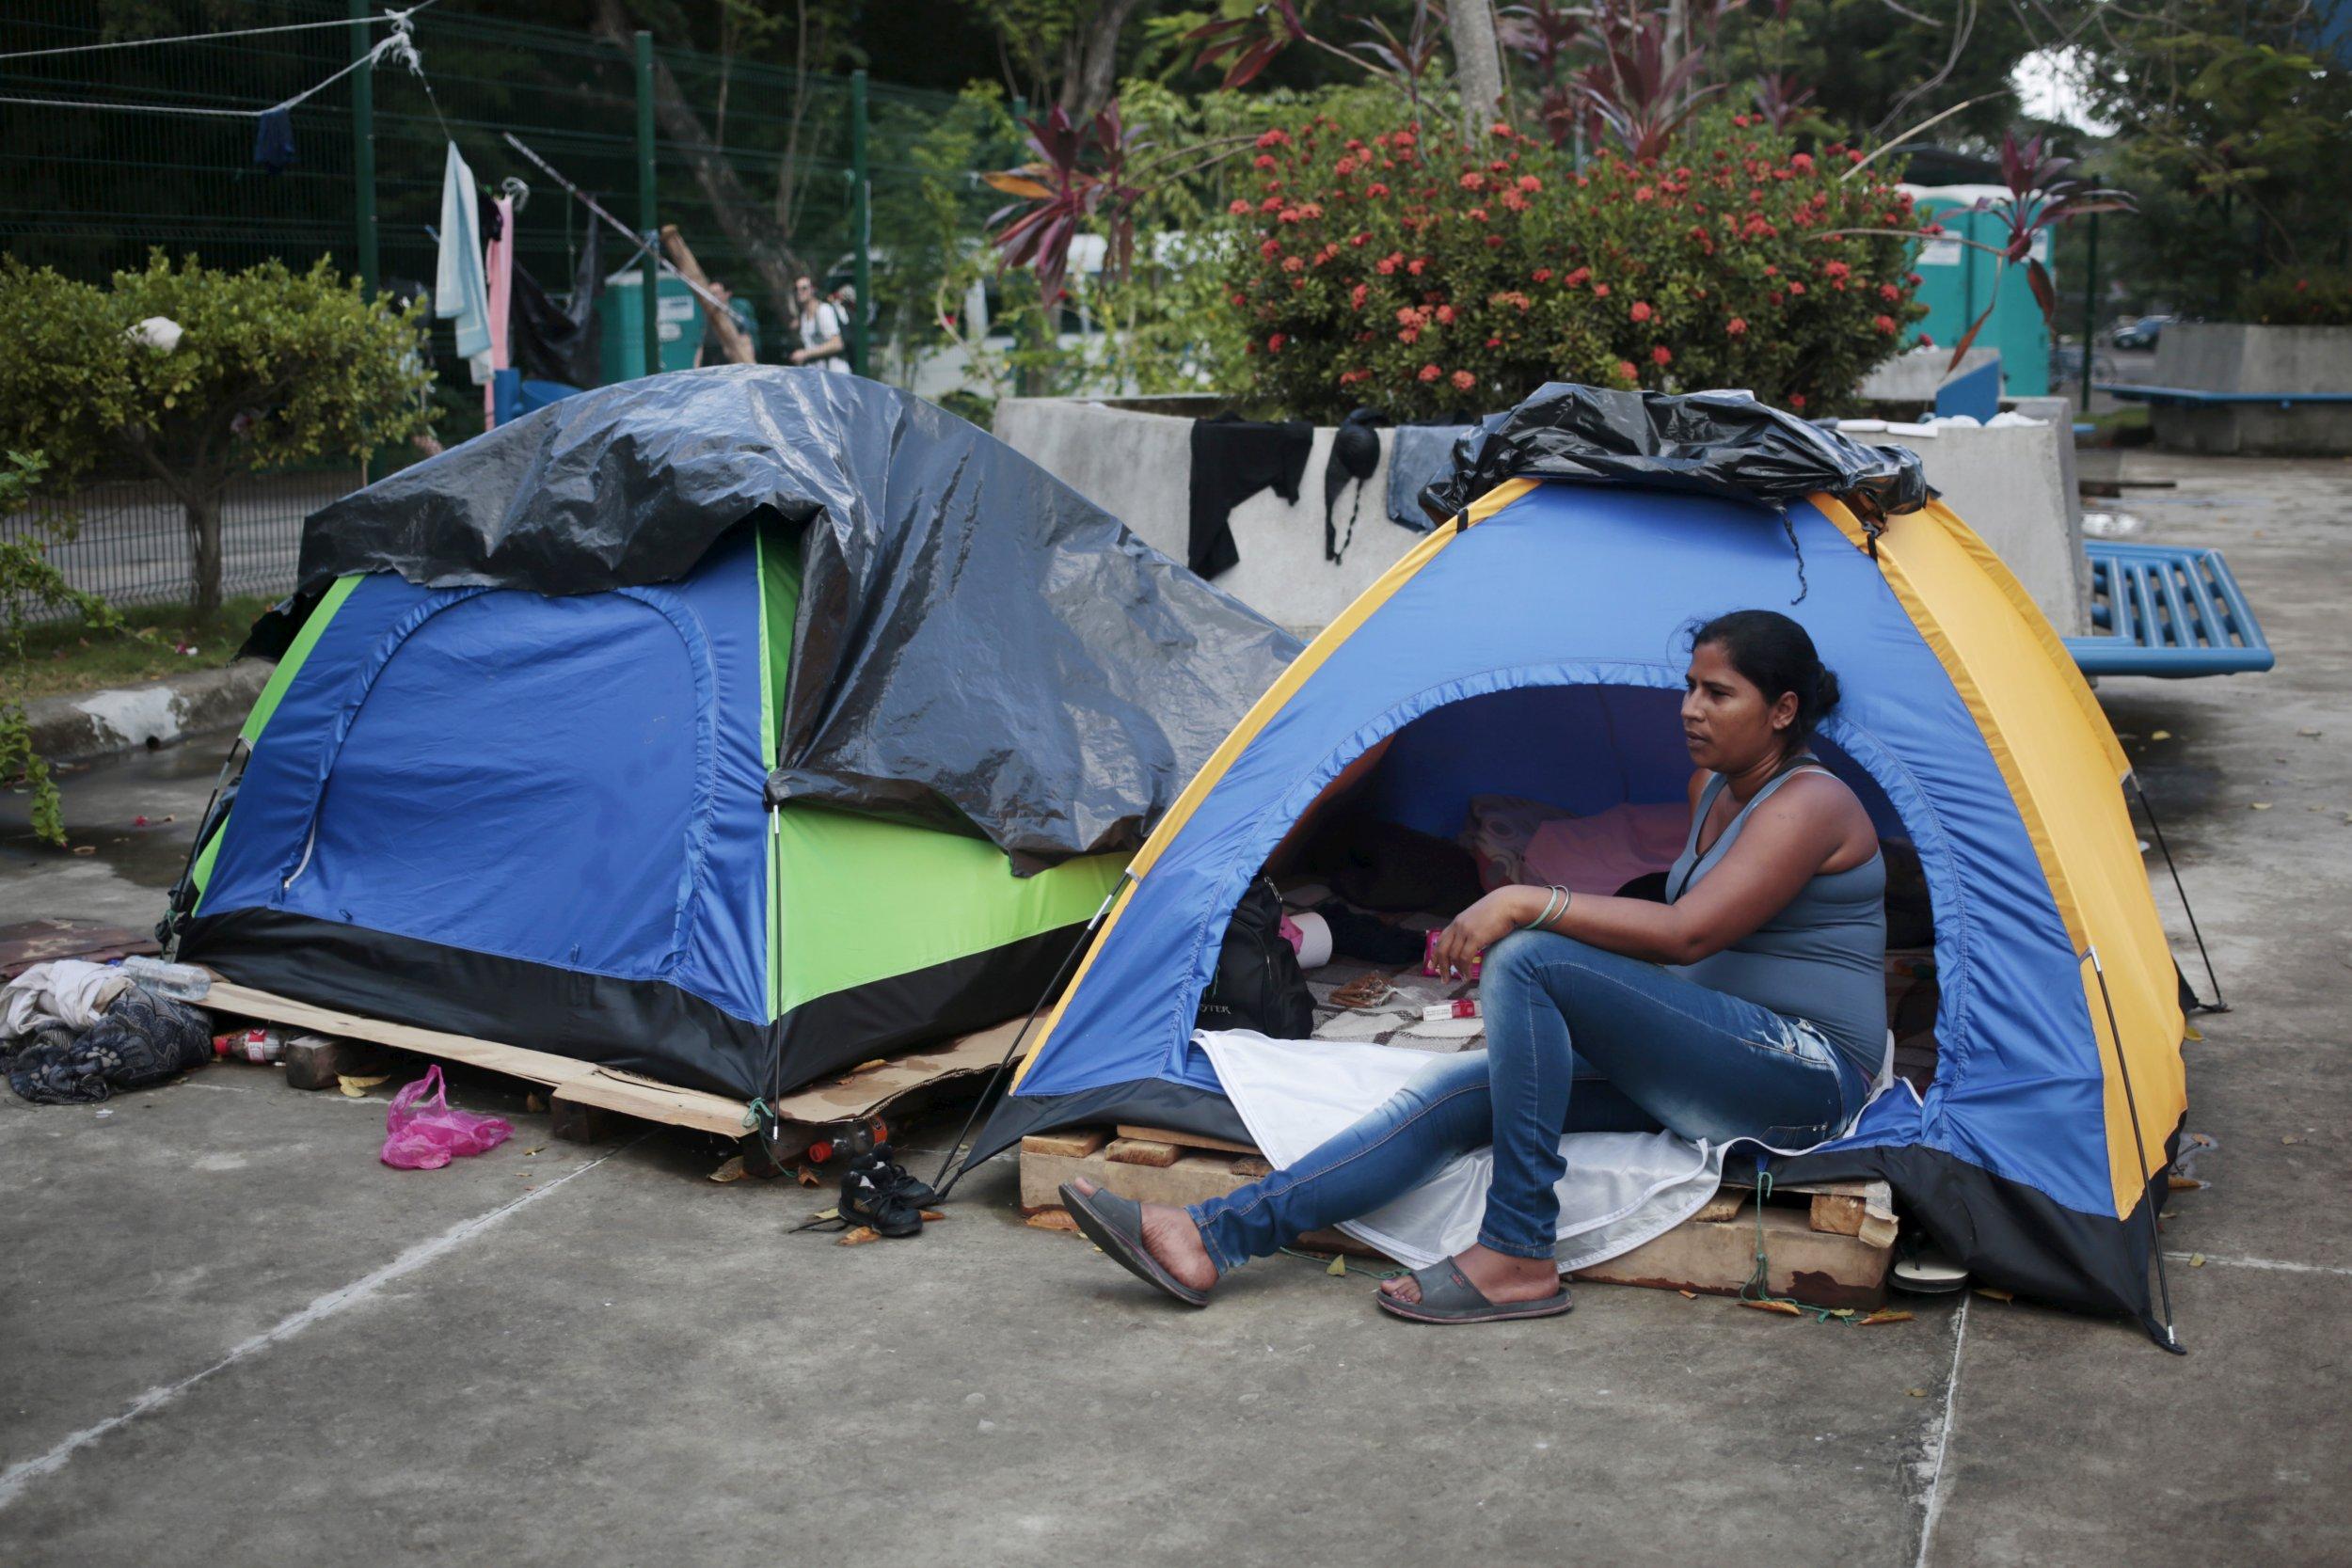 cuban migrants in Costa Rica